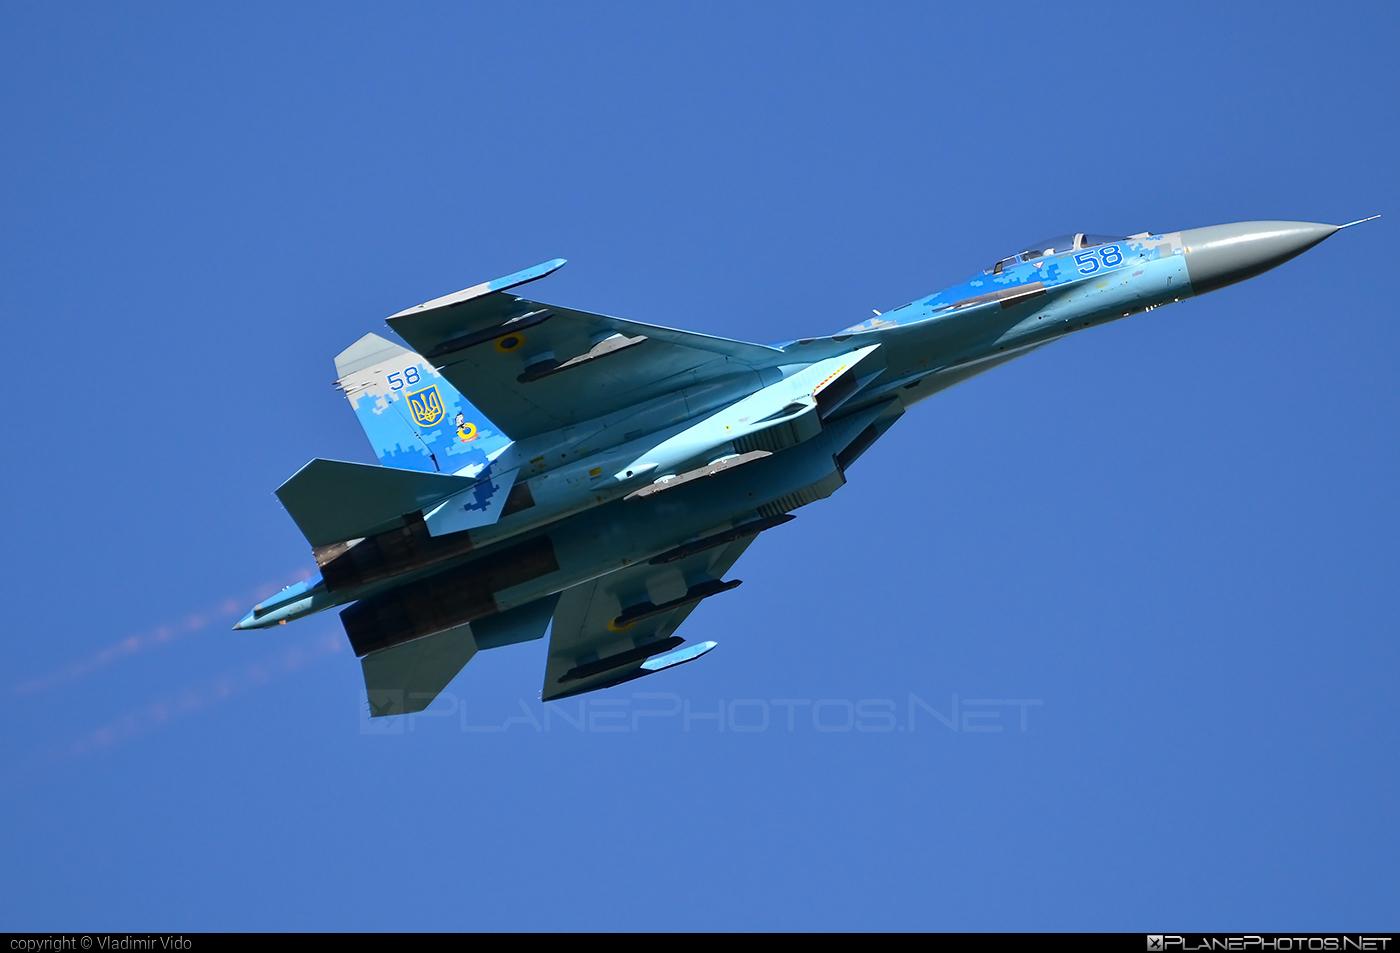 Sukhoi Su-27P - 58 operated by Povitryani Syly Ukrayiny (Ukrainian Air Force) #povitryanisylyukrayiny #siaf2016 #su27 #su27p #sukhoi #sukhoi27 #ukrainianairforce